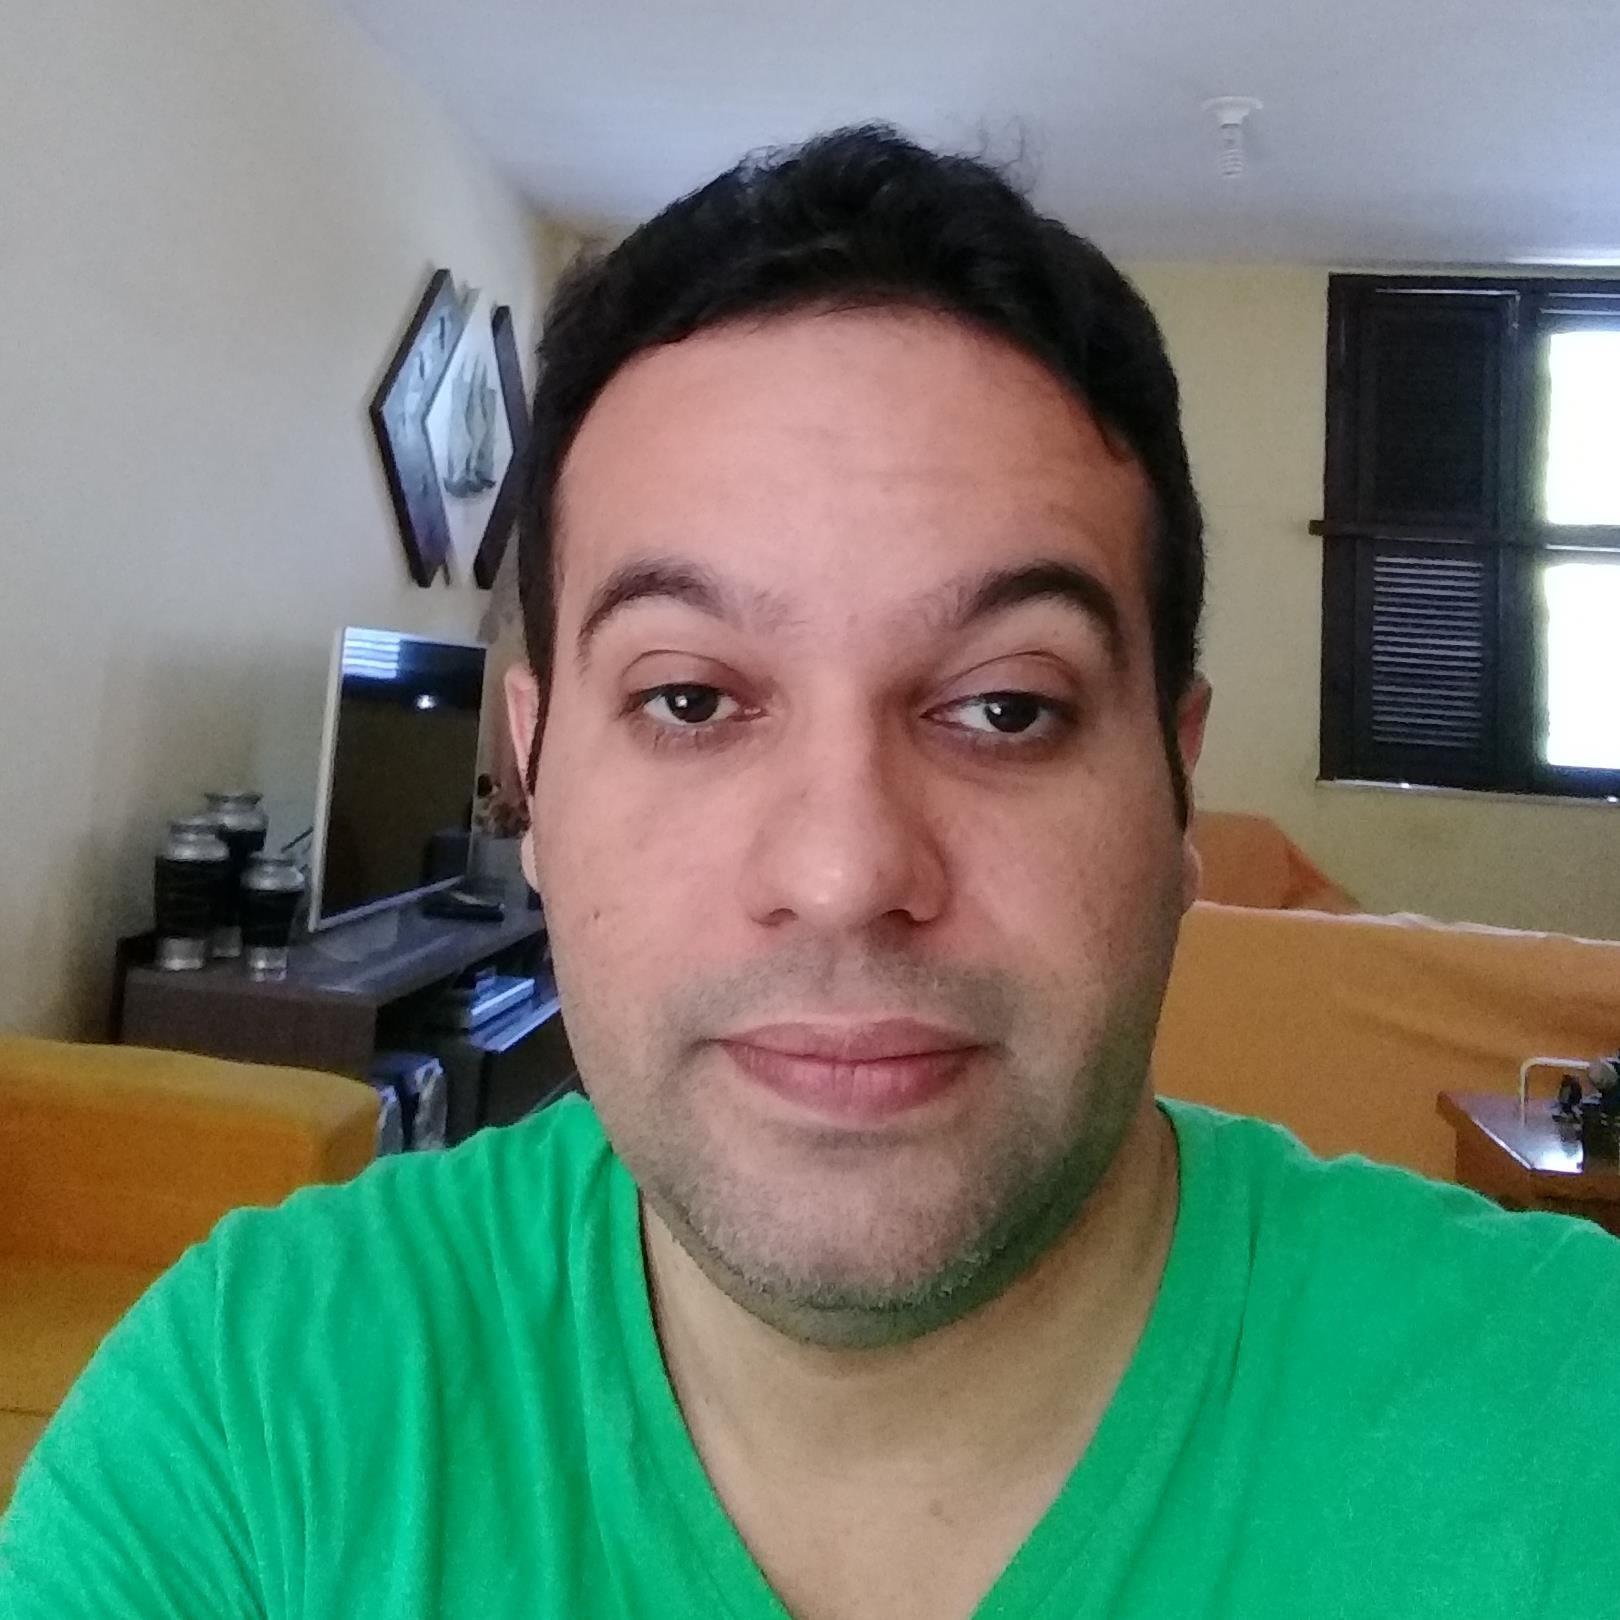 Luciano de Oliveira